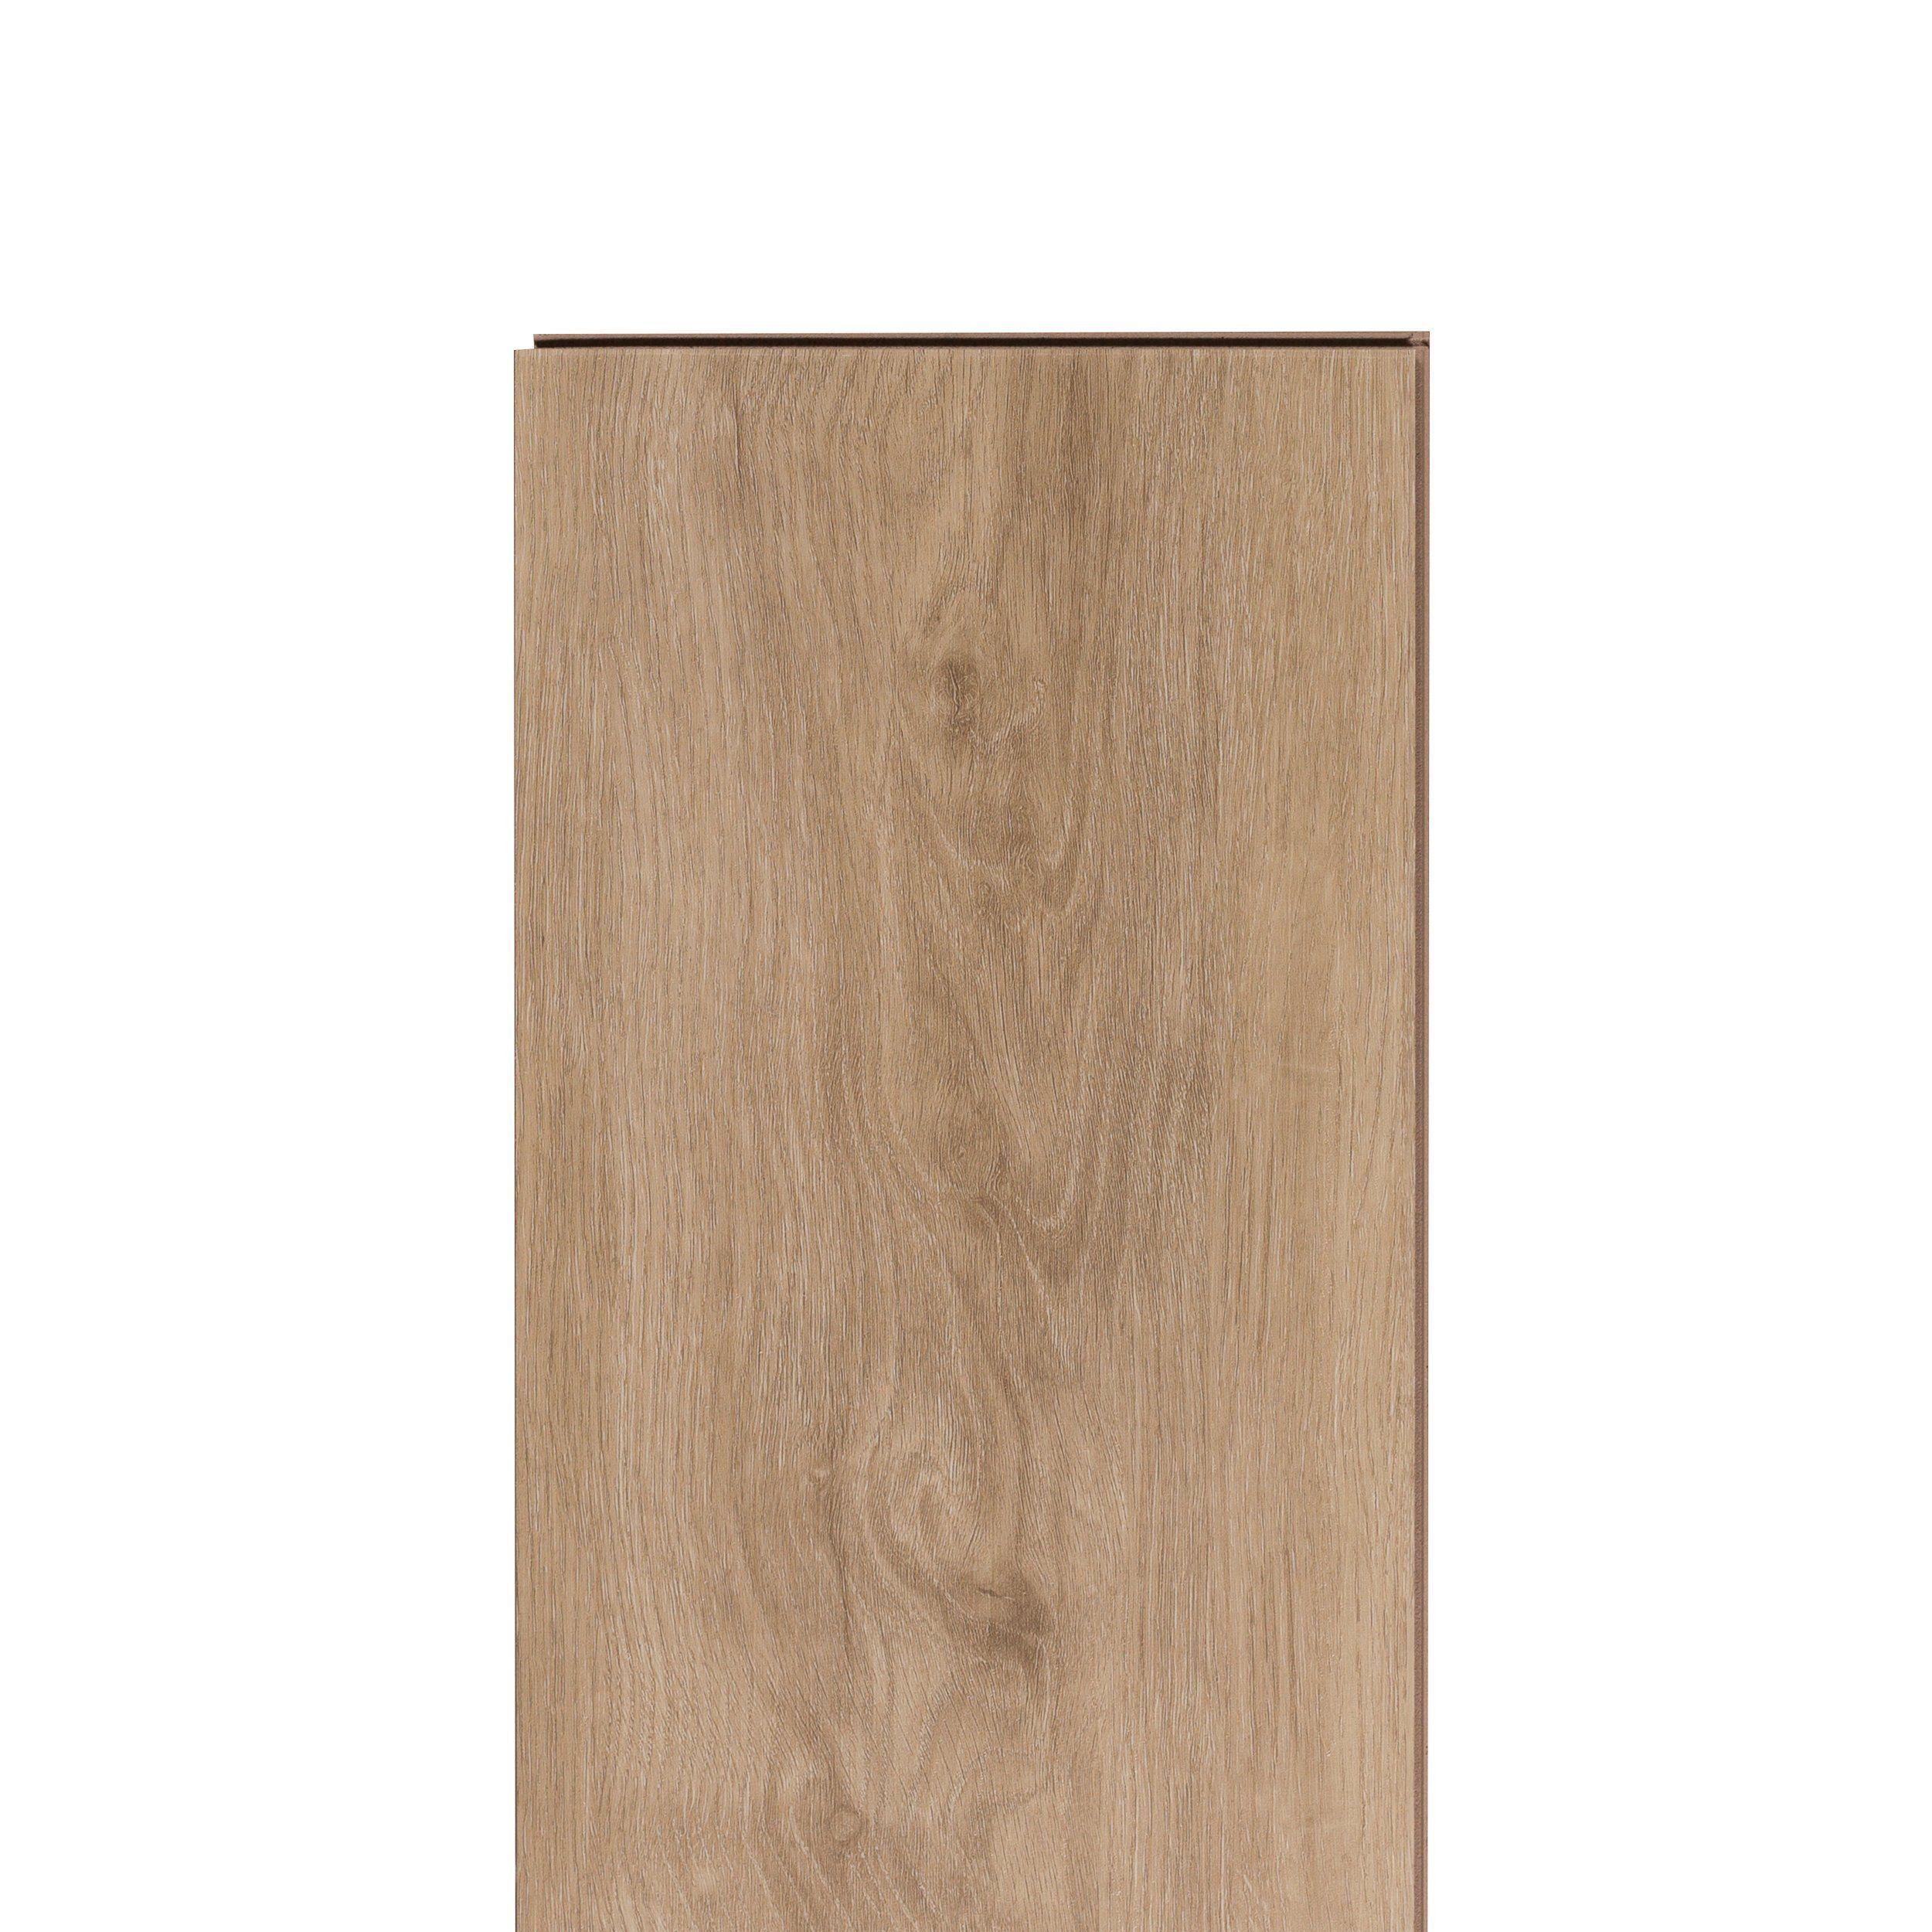 Gray Blonde Rigid Core Luxury Vinyl Plank Cork Back Vinyl Plank Luxury Vinyl Plank Luxury Vinyl